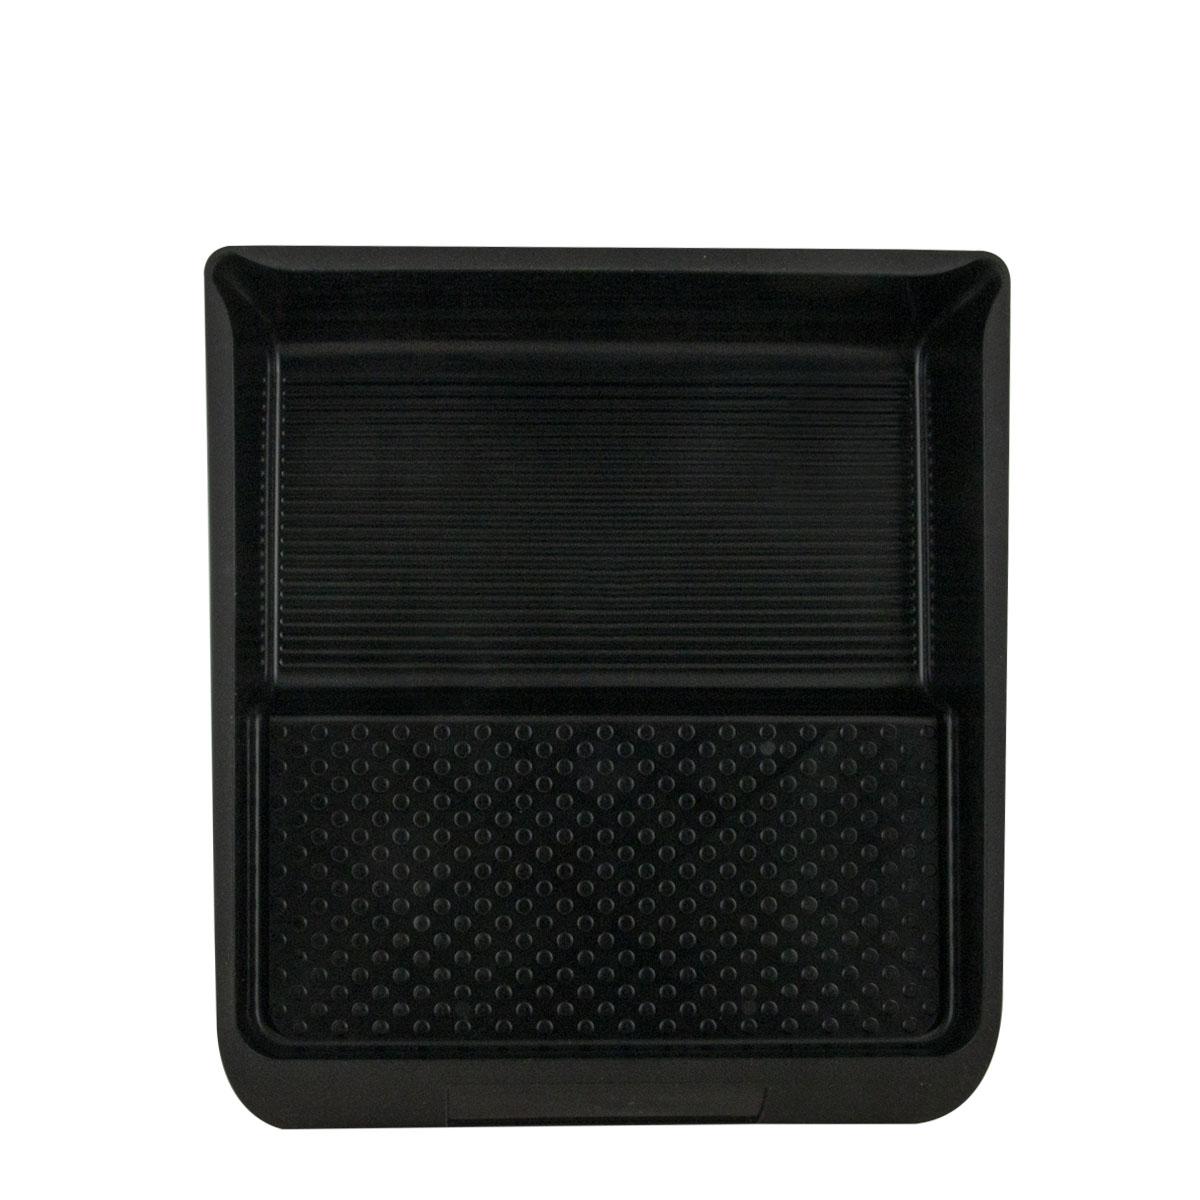 Farbklecks24 Farbwanne Kunststoff, schwarz, Lackwanne, 32 x 36cm